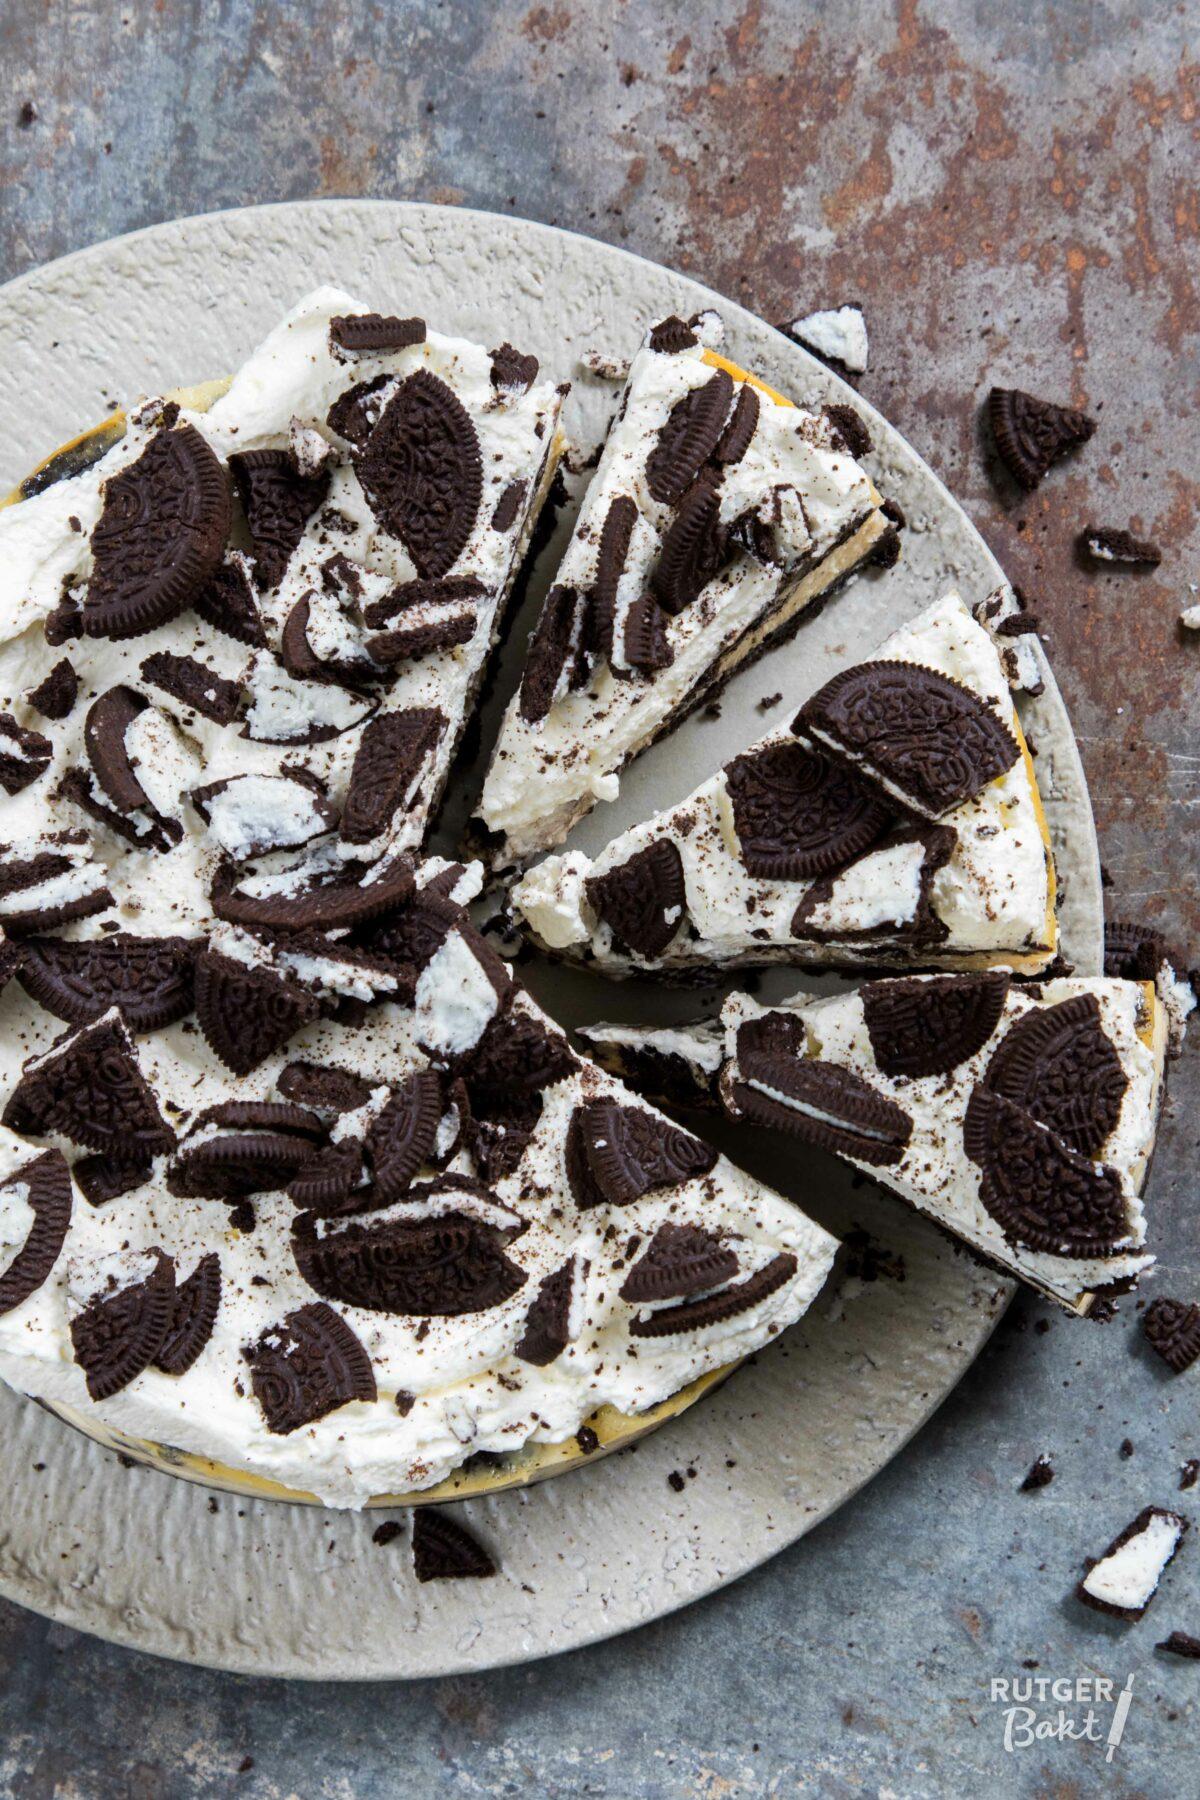 Hedendaags De lekkerste oreo cheesecake – recept - Rutger Bakt NO-28